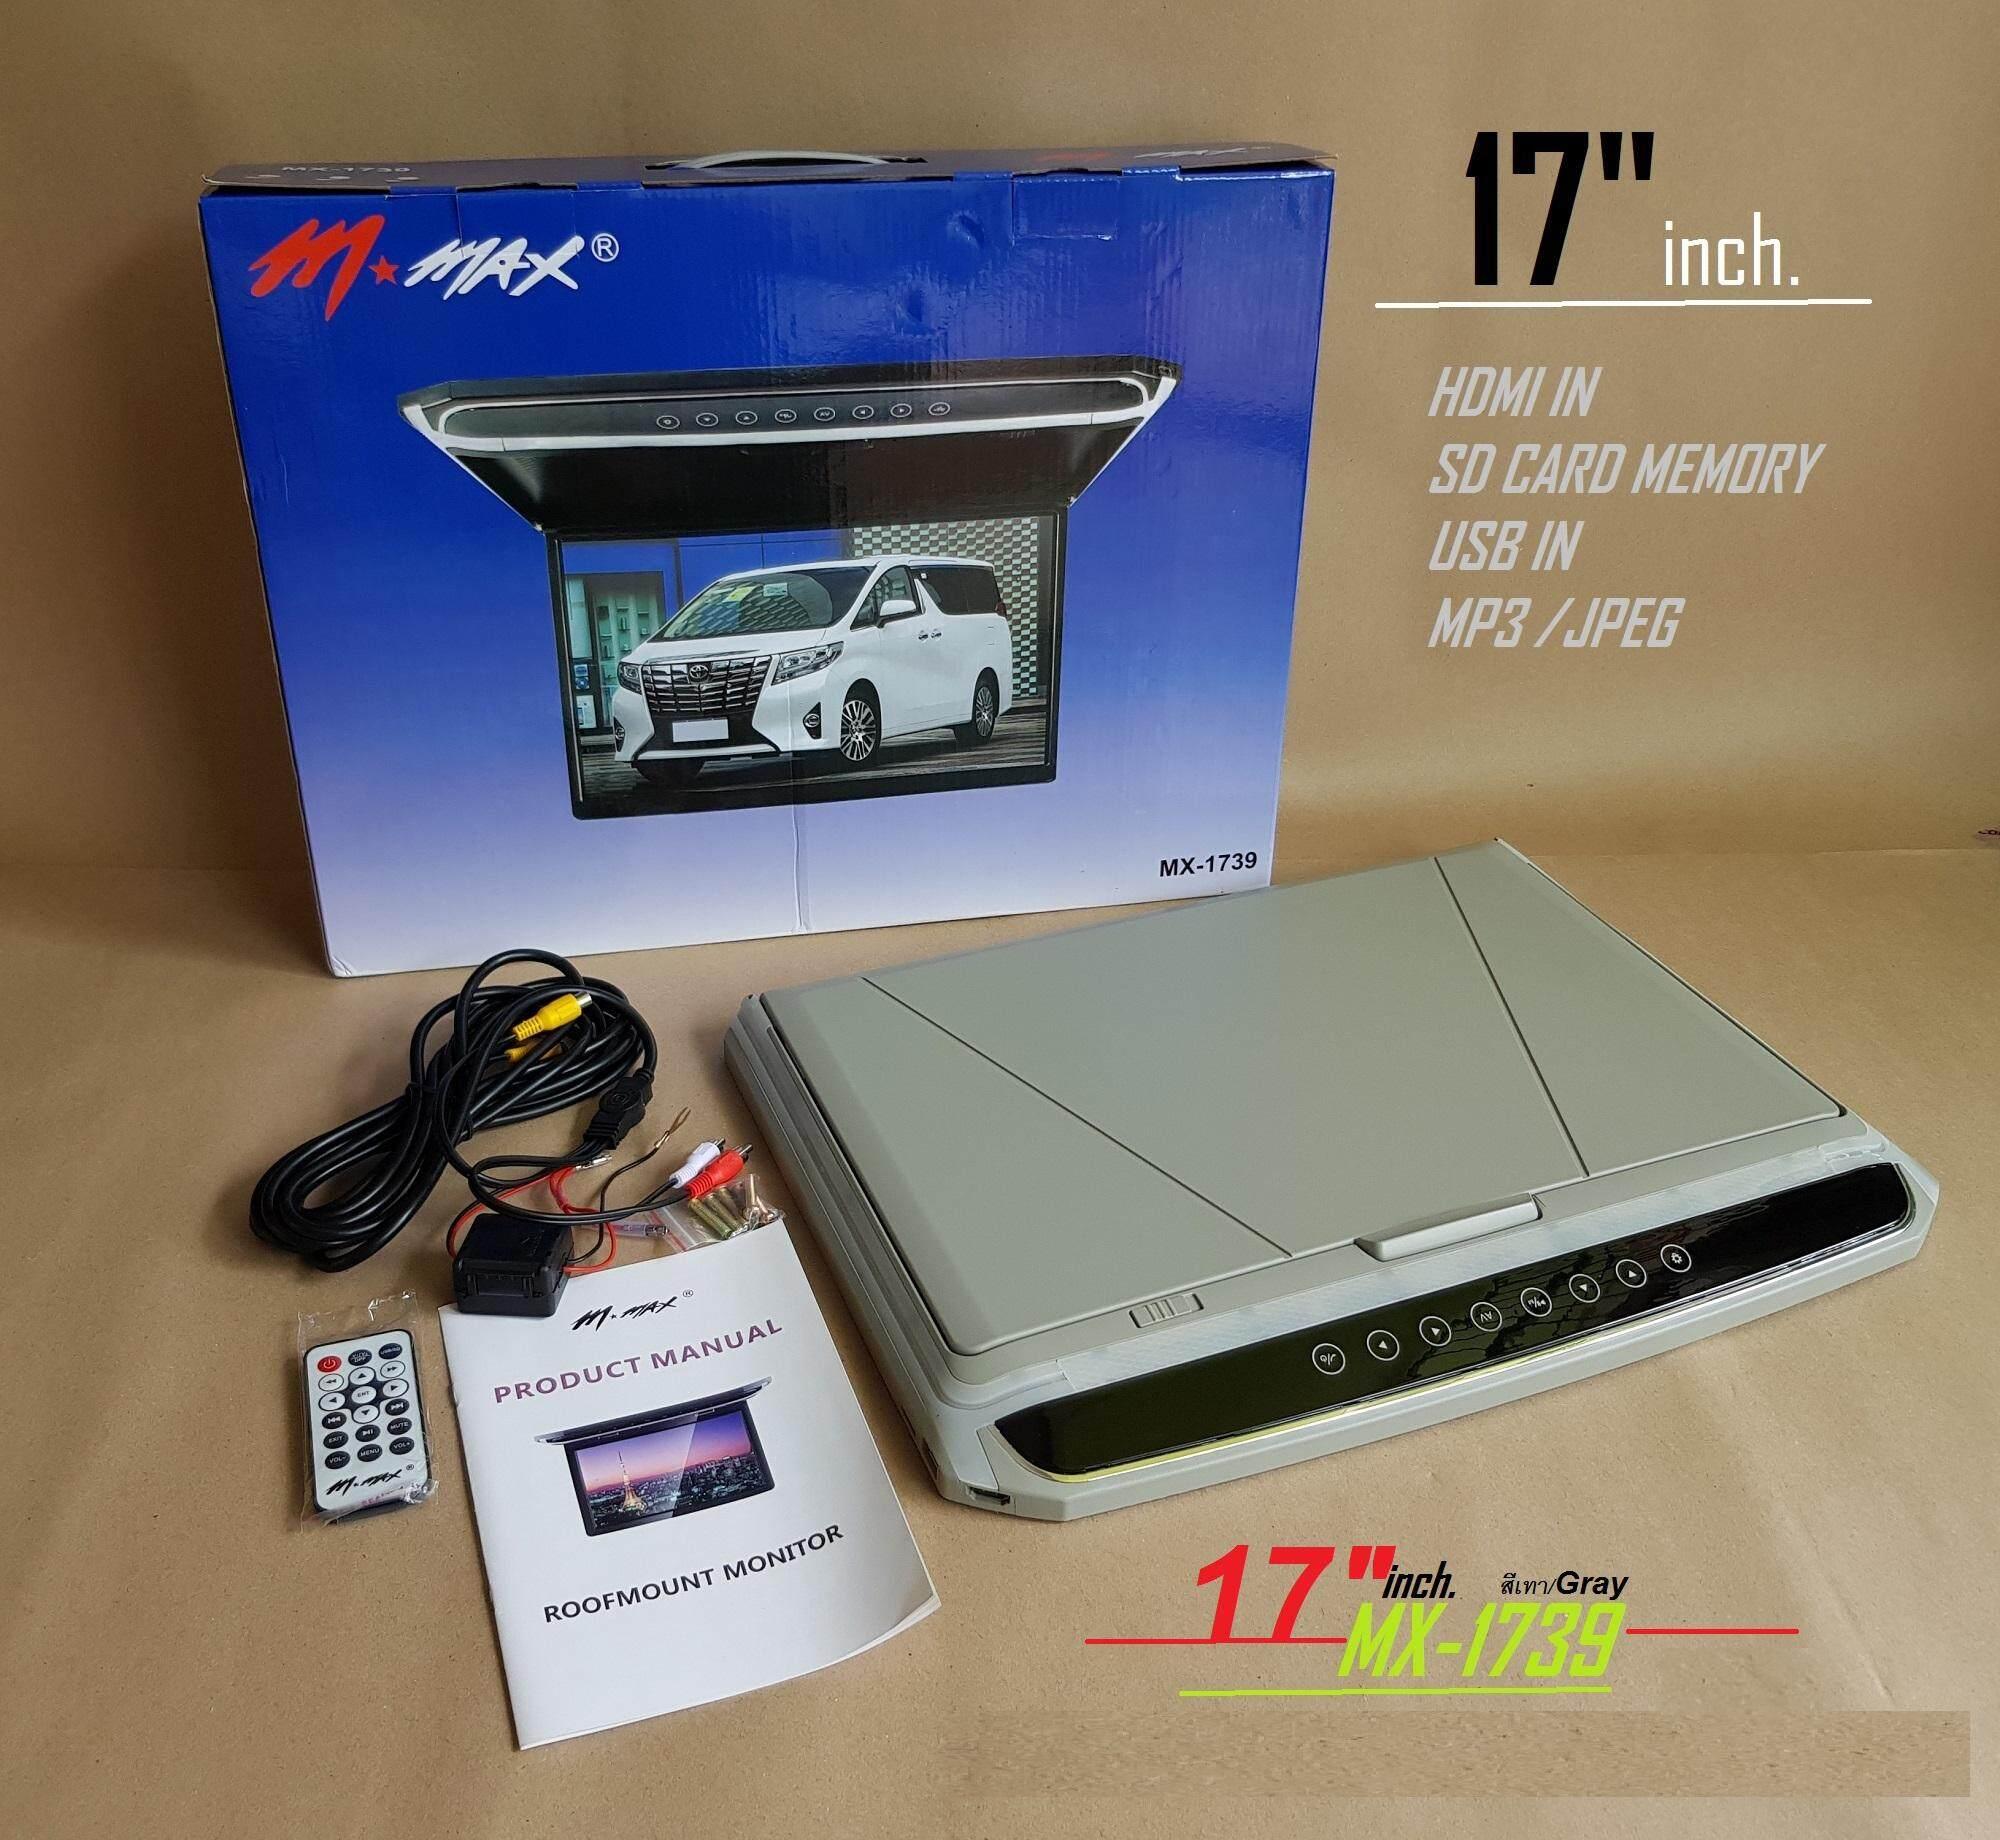 M-Max จอเพดานสำหรับรถยนต์ ขนาดจอ 17 นิ้ว(แบบบาง) ช่องต่อ Hdmi Input/led/hd/avinput/ ไฟเพดาน/ Tft และปุ่มสวิทช์ แบบนิ้วสัมผัส (สีเทา/gray).